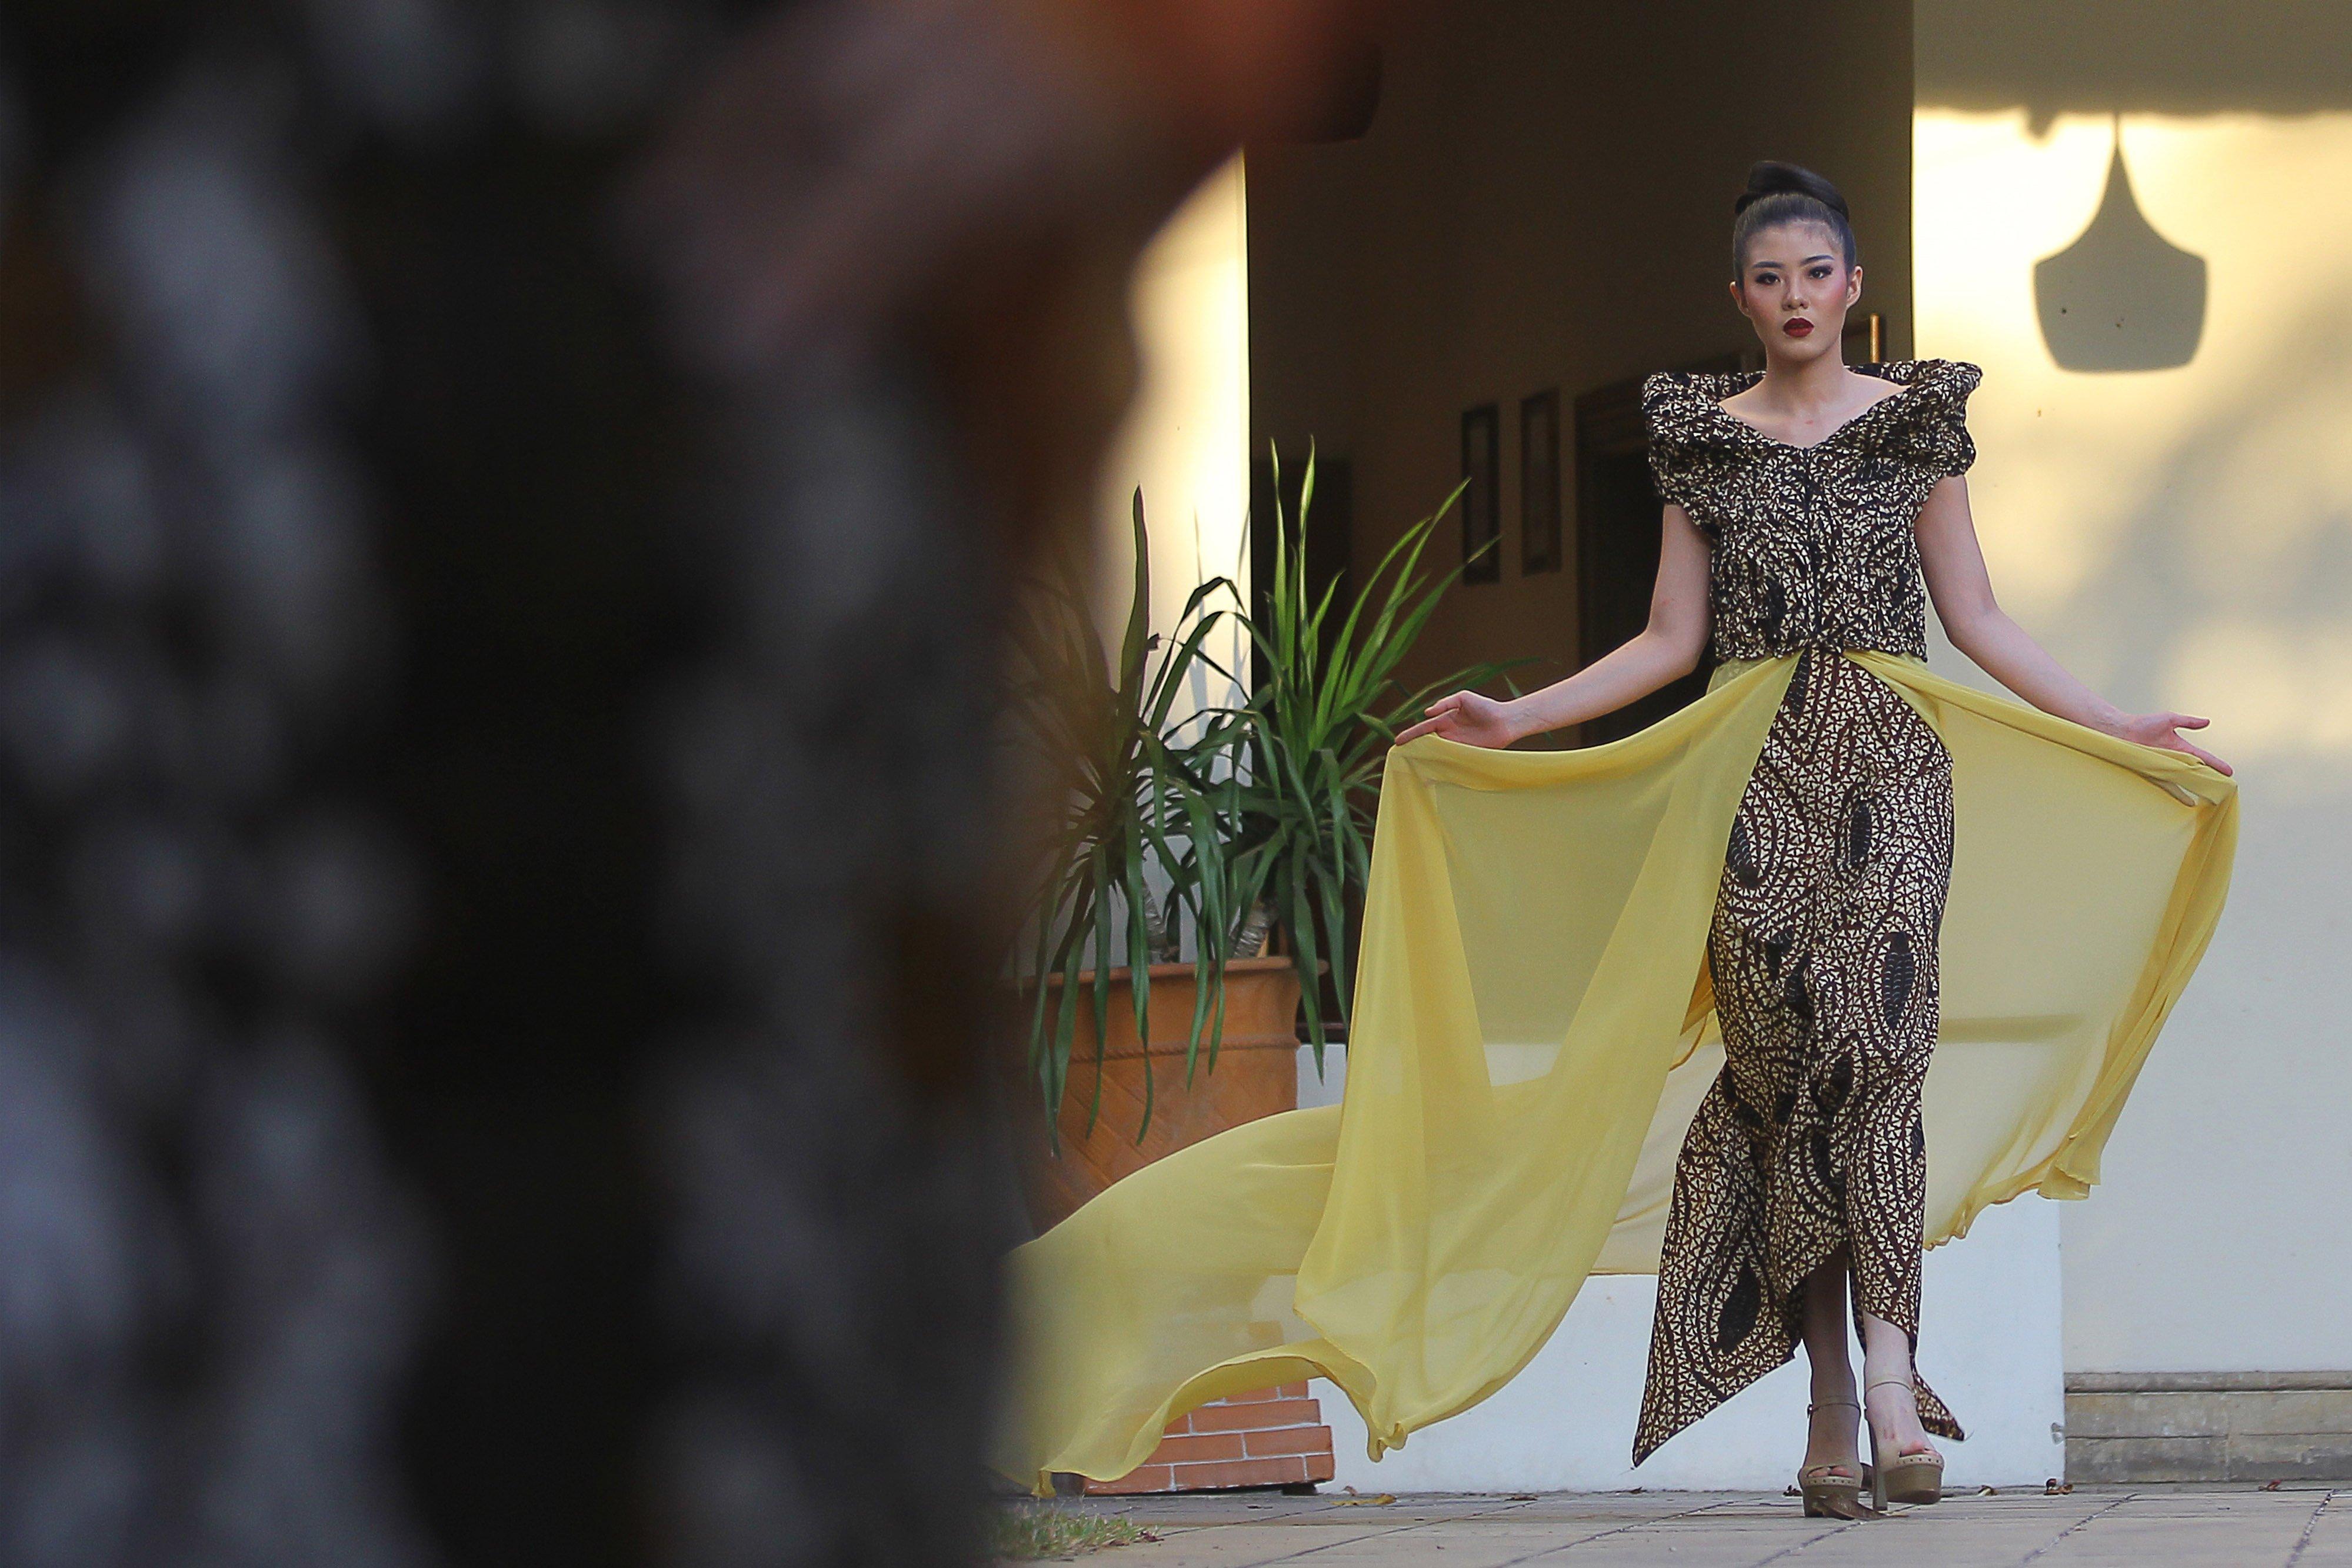 Model memperagakan busana dari bahan kain batik rancangan Embran Nawawi saat perayaan Hari Batik Nasional di Surabaya, Jawa Timur, Jumat (2/10/2020). Perayaan Hari Batik Nasional bertajuk \